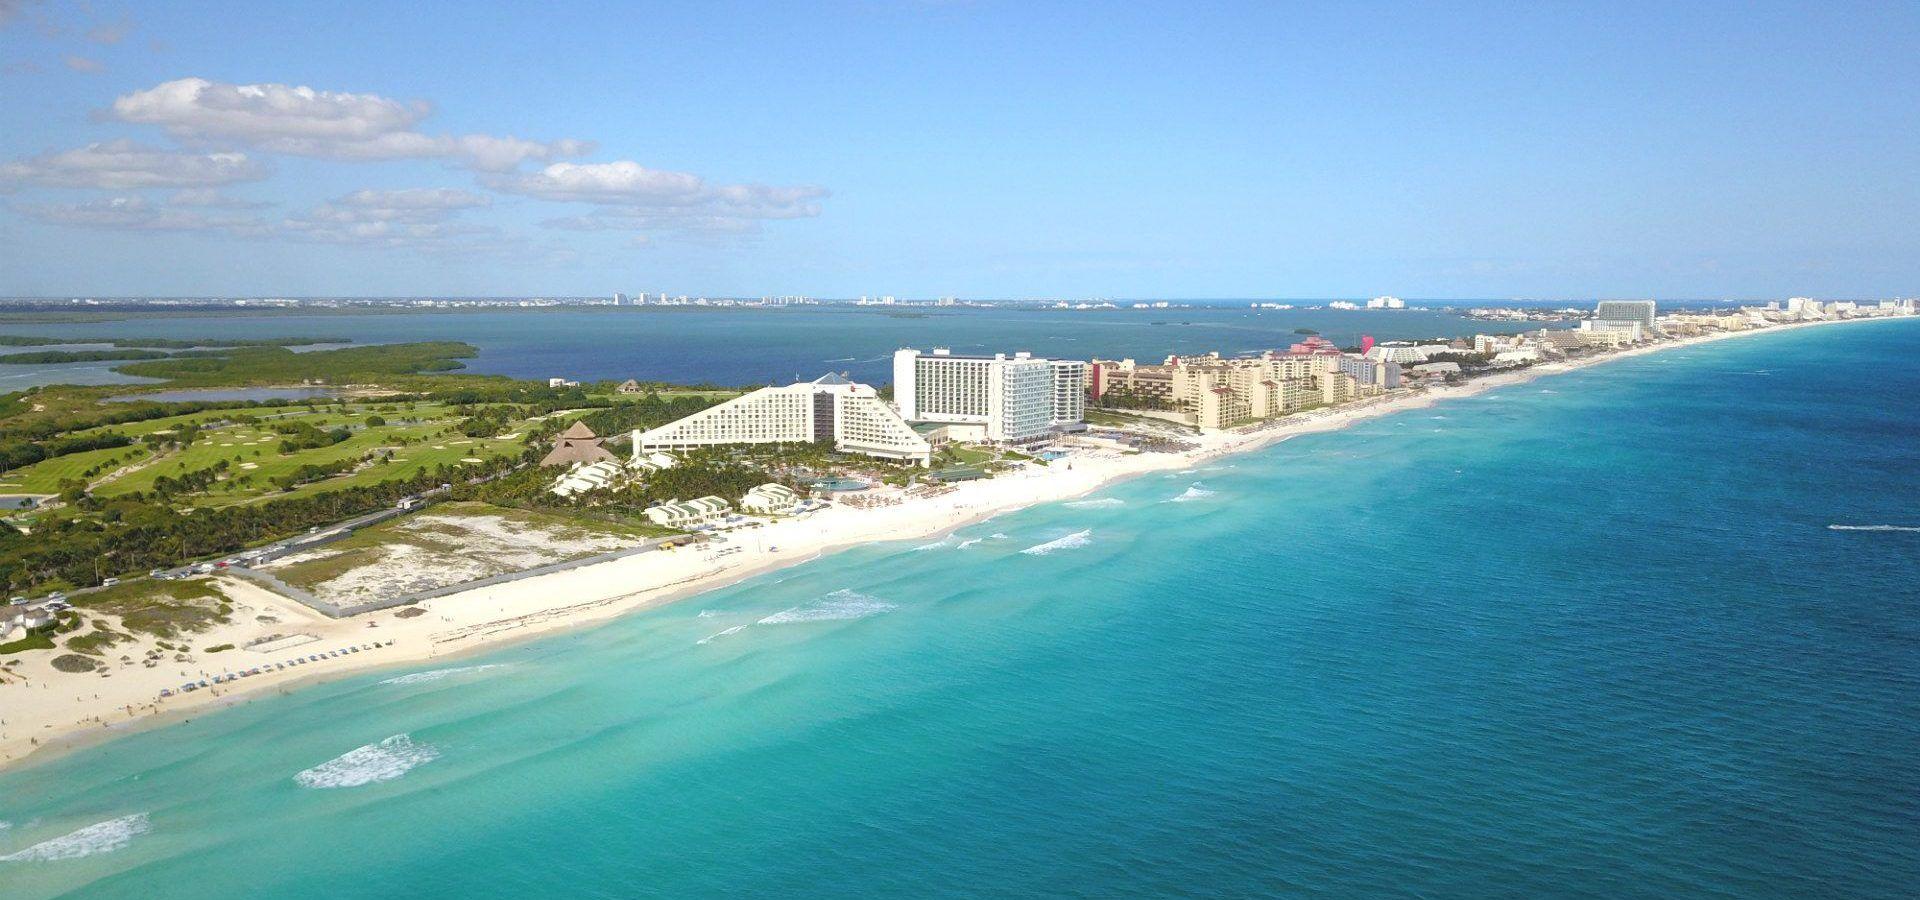 Cancun Beautiful Beaches Most Beautiful Beaches Cancun Activities